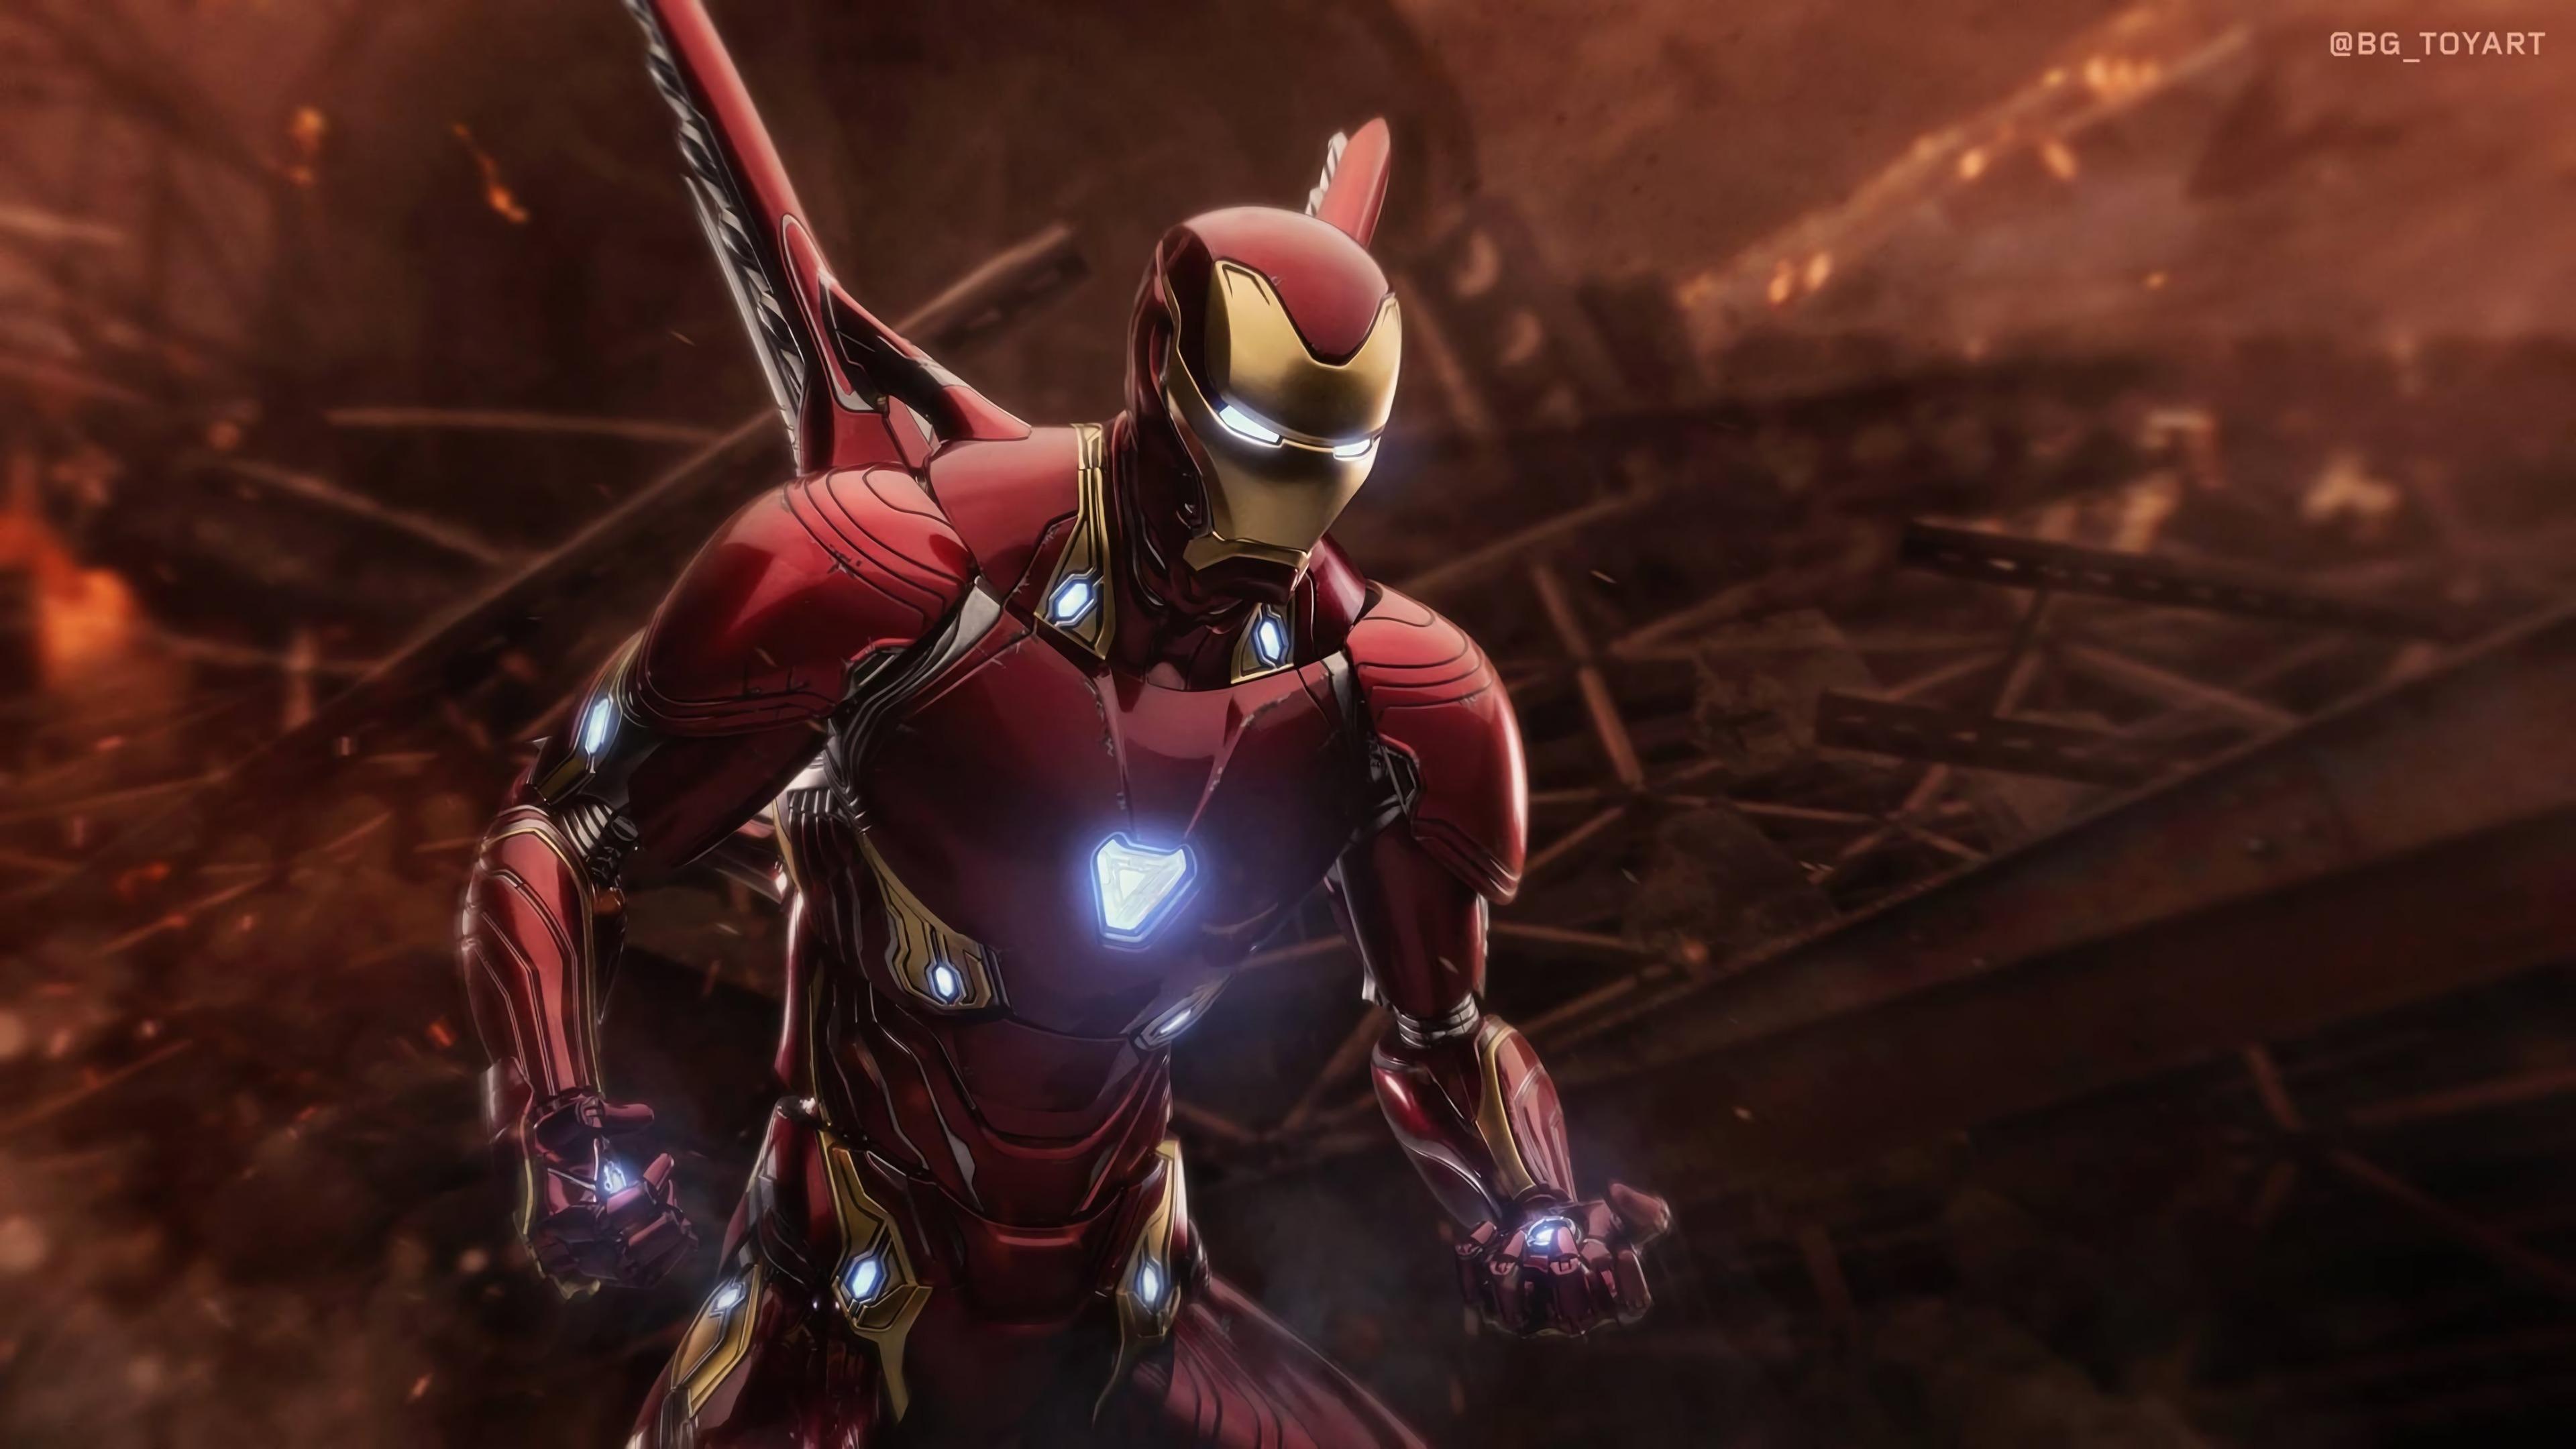 iron man 2019 1568054828 - Iron Man 2019 - superheroes wallpapers, iron man wallpapers, hd-wallpapers, digital art wallpapers, artwork wallpapers, 4k-wallpapers